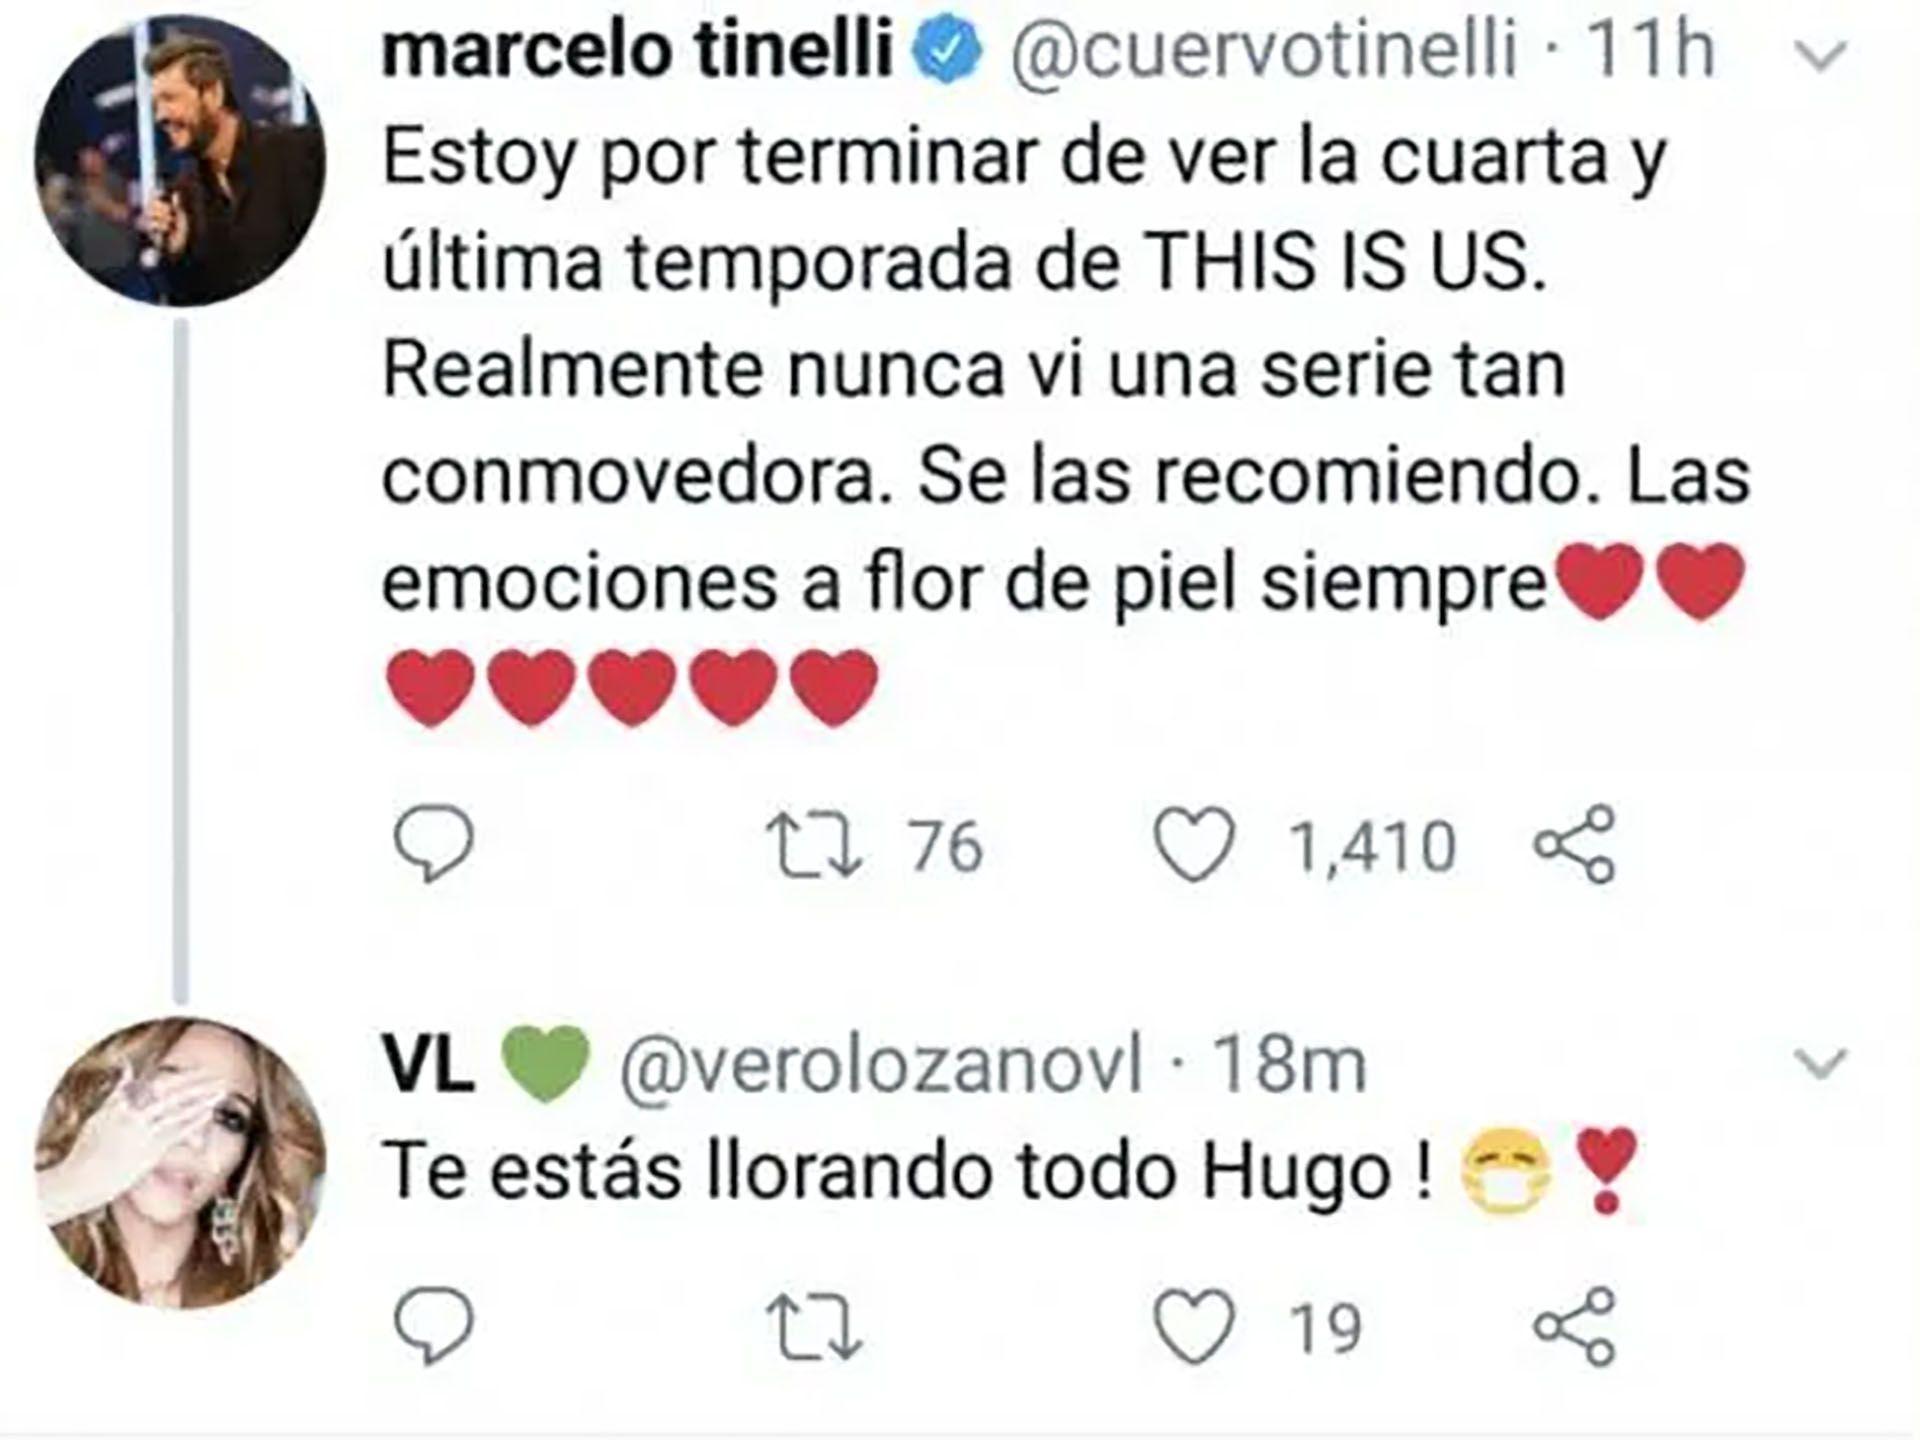 Marcelo Tinelli se declaro fanático de This is up